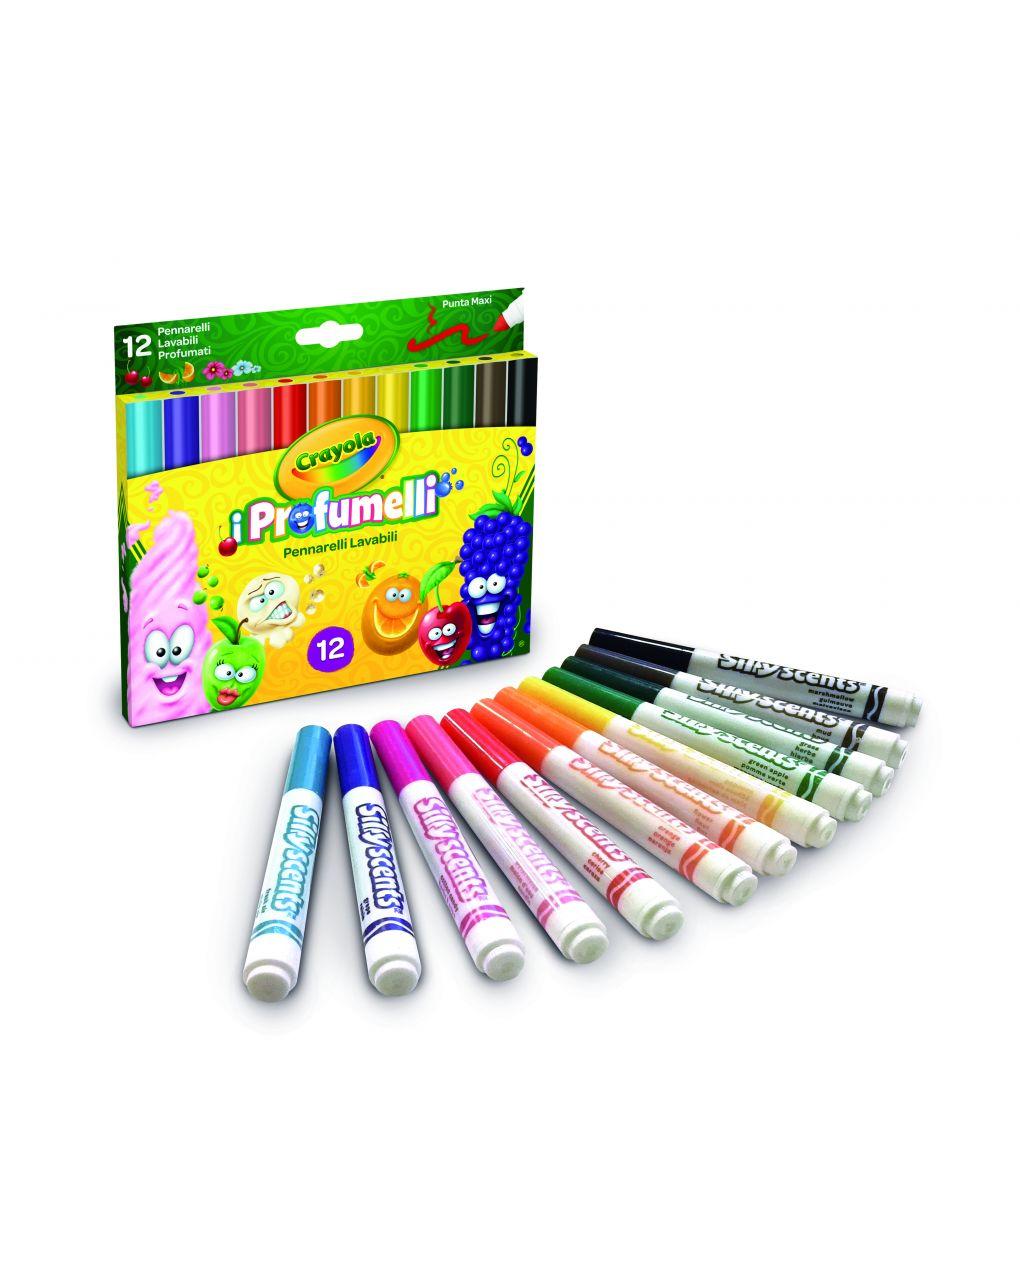 Crayola - 12 pennarelli profumelli maxi punta lavabili - Crayola